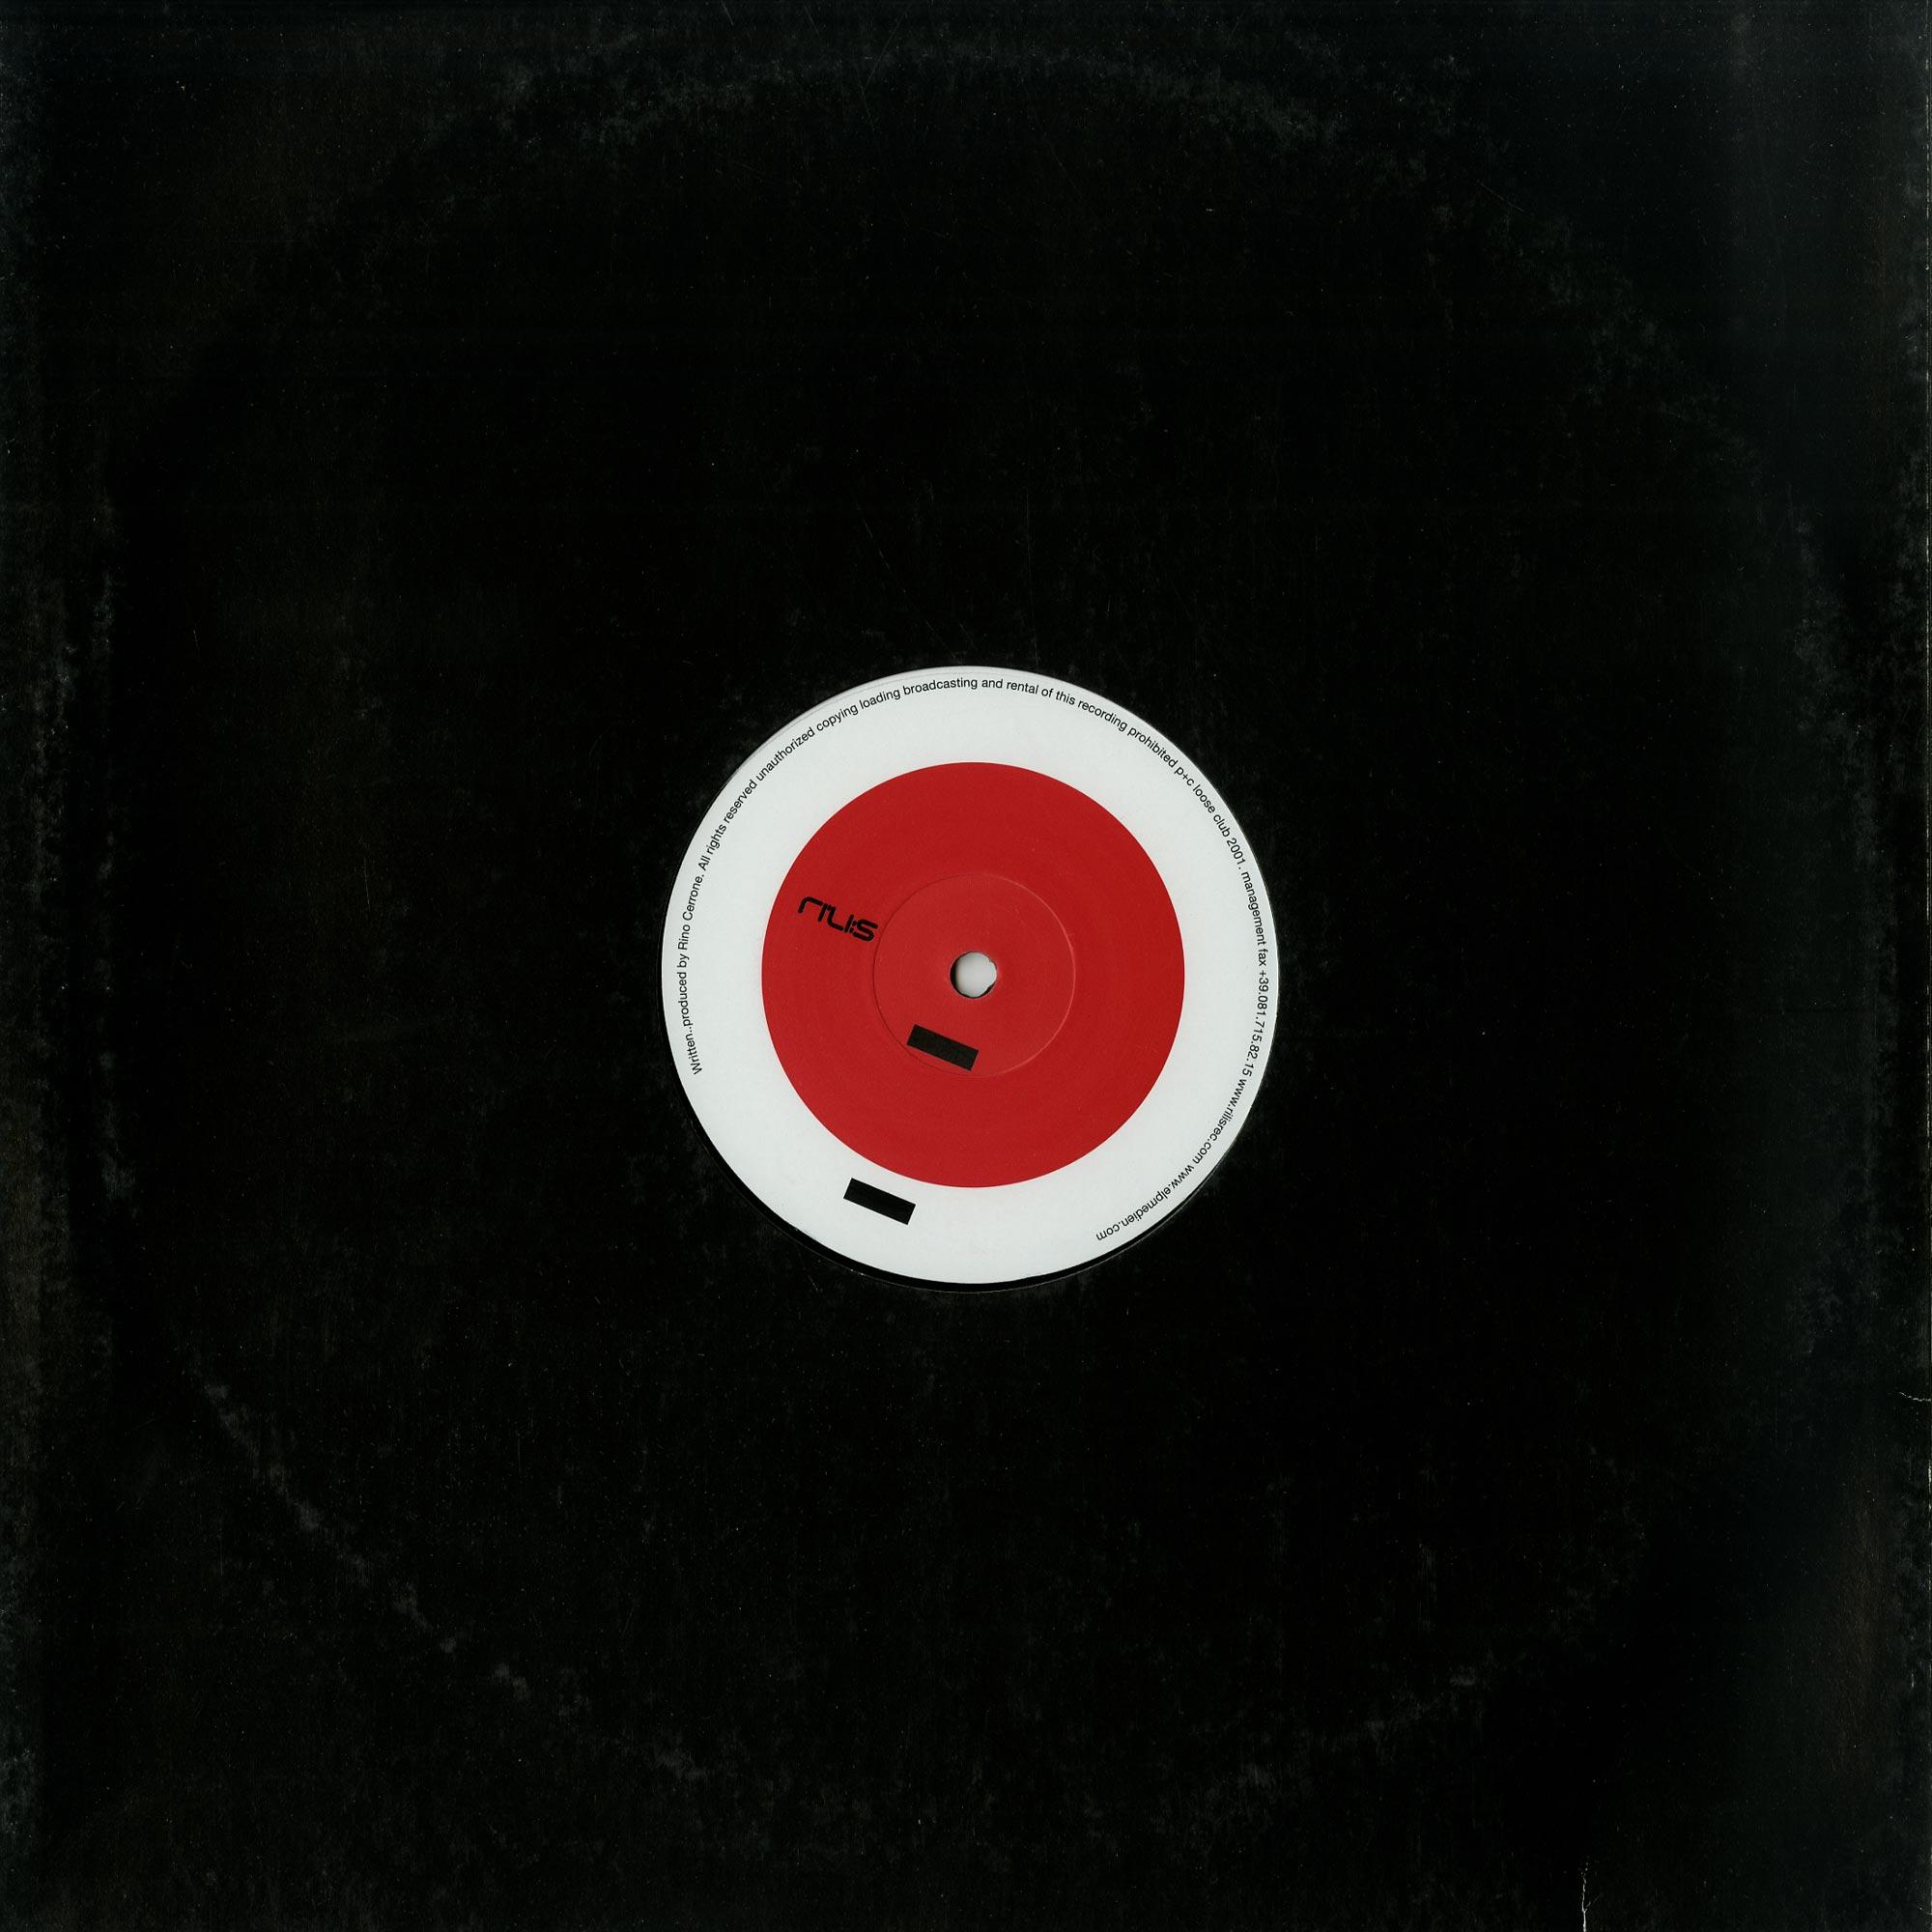 Rino Cerrone - RILIS 07